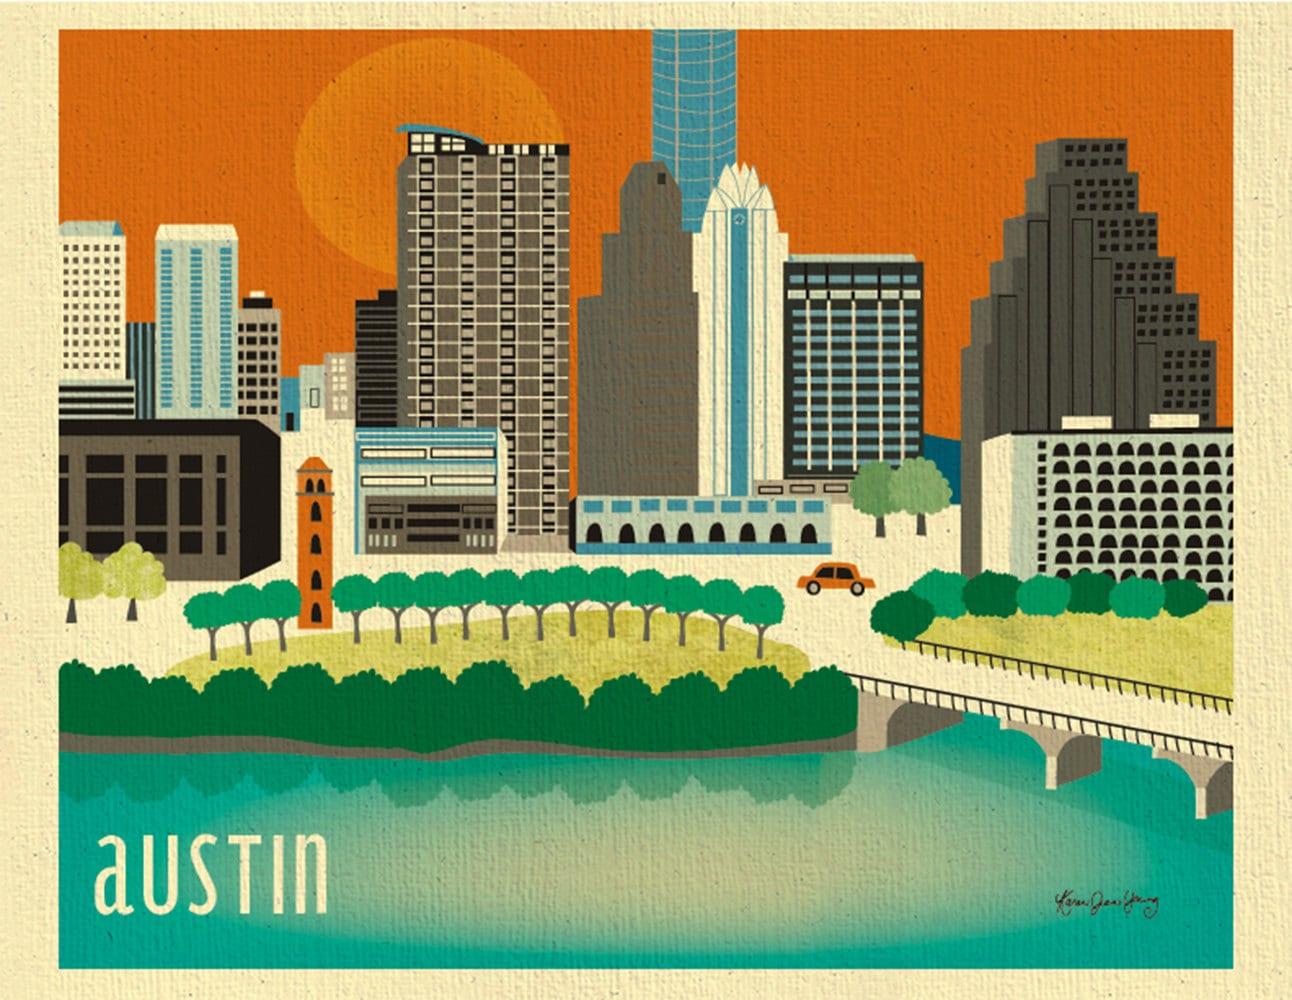 Color printing austin - Austin Skyline Art Print Austin Map Austin Poster Texas Poster Austin Nursery Art Loose Petals Texas City Art Print Style E8 O Au